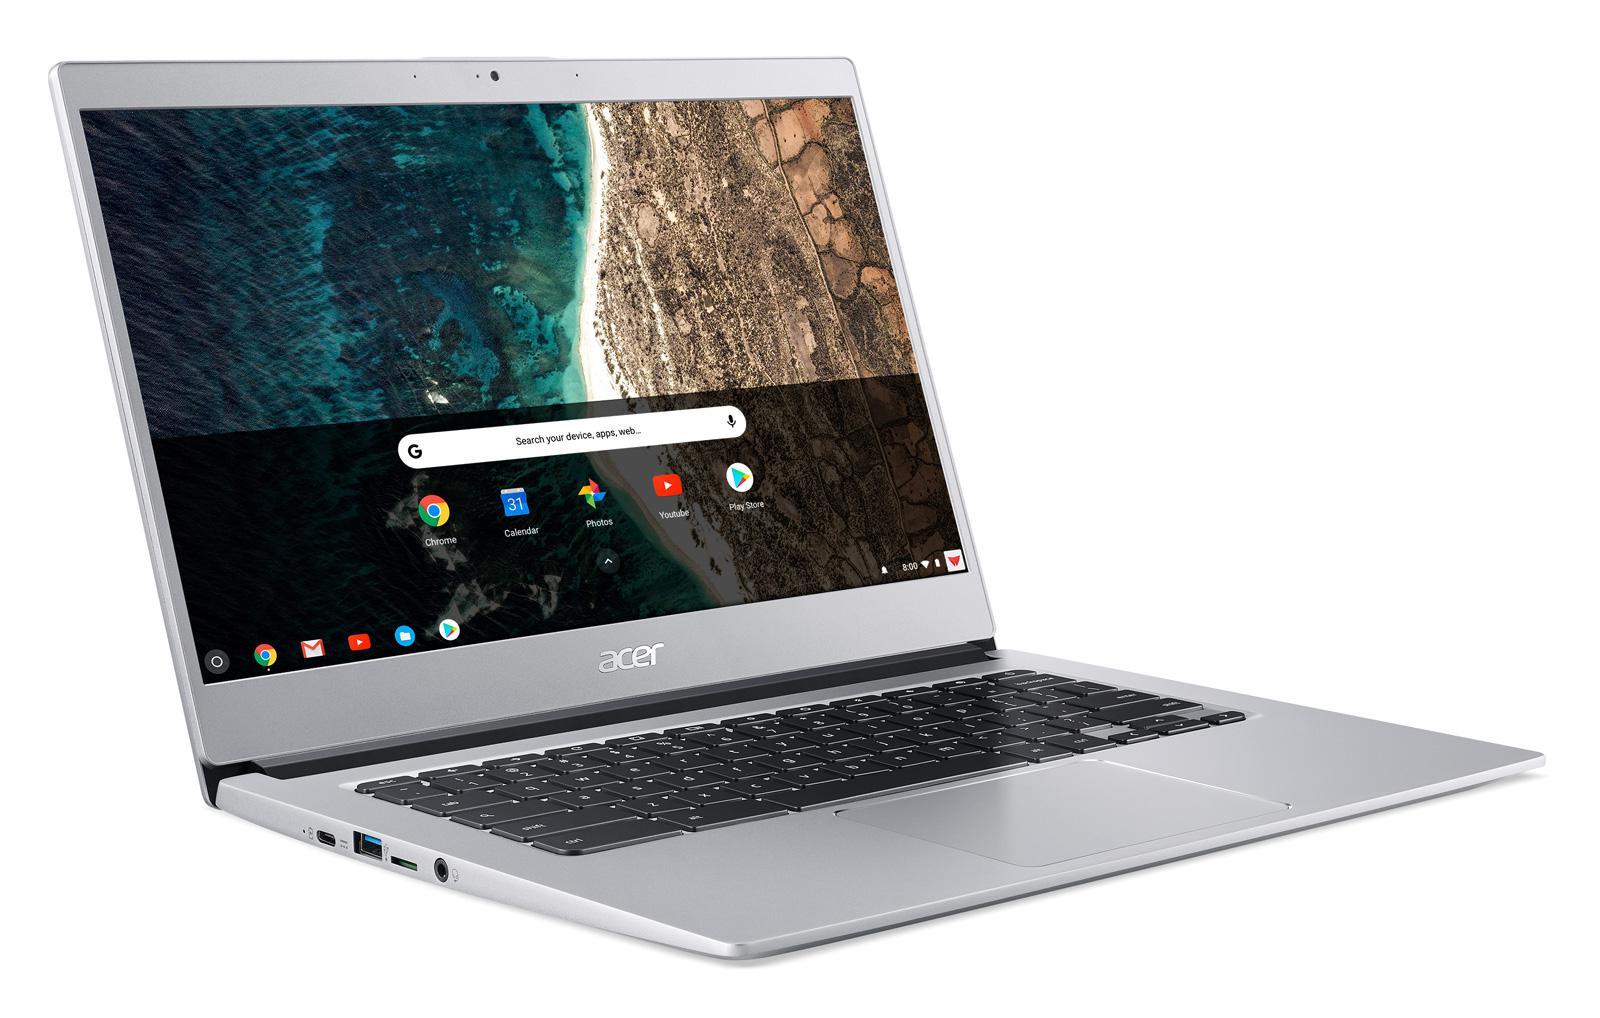 Acer新机Chromebook514即将发布 采用铝制机身售价约合人民币2390元